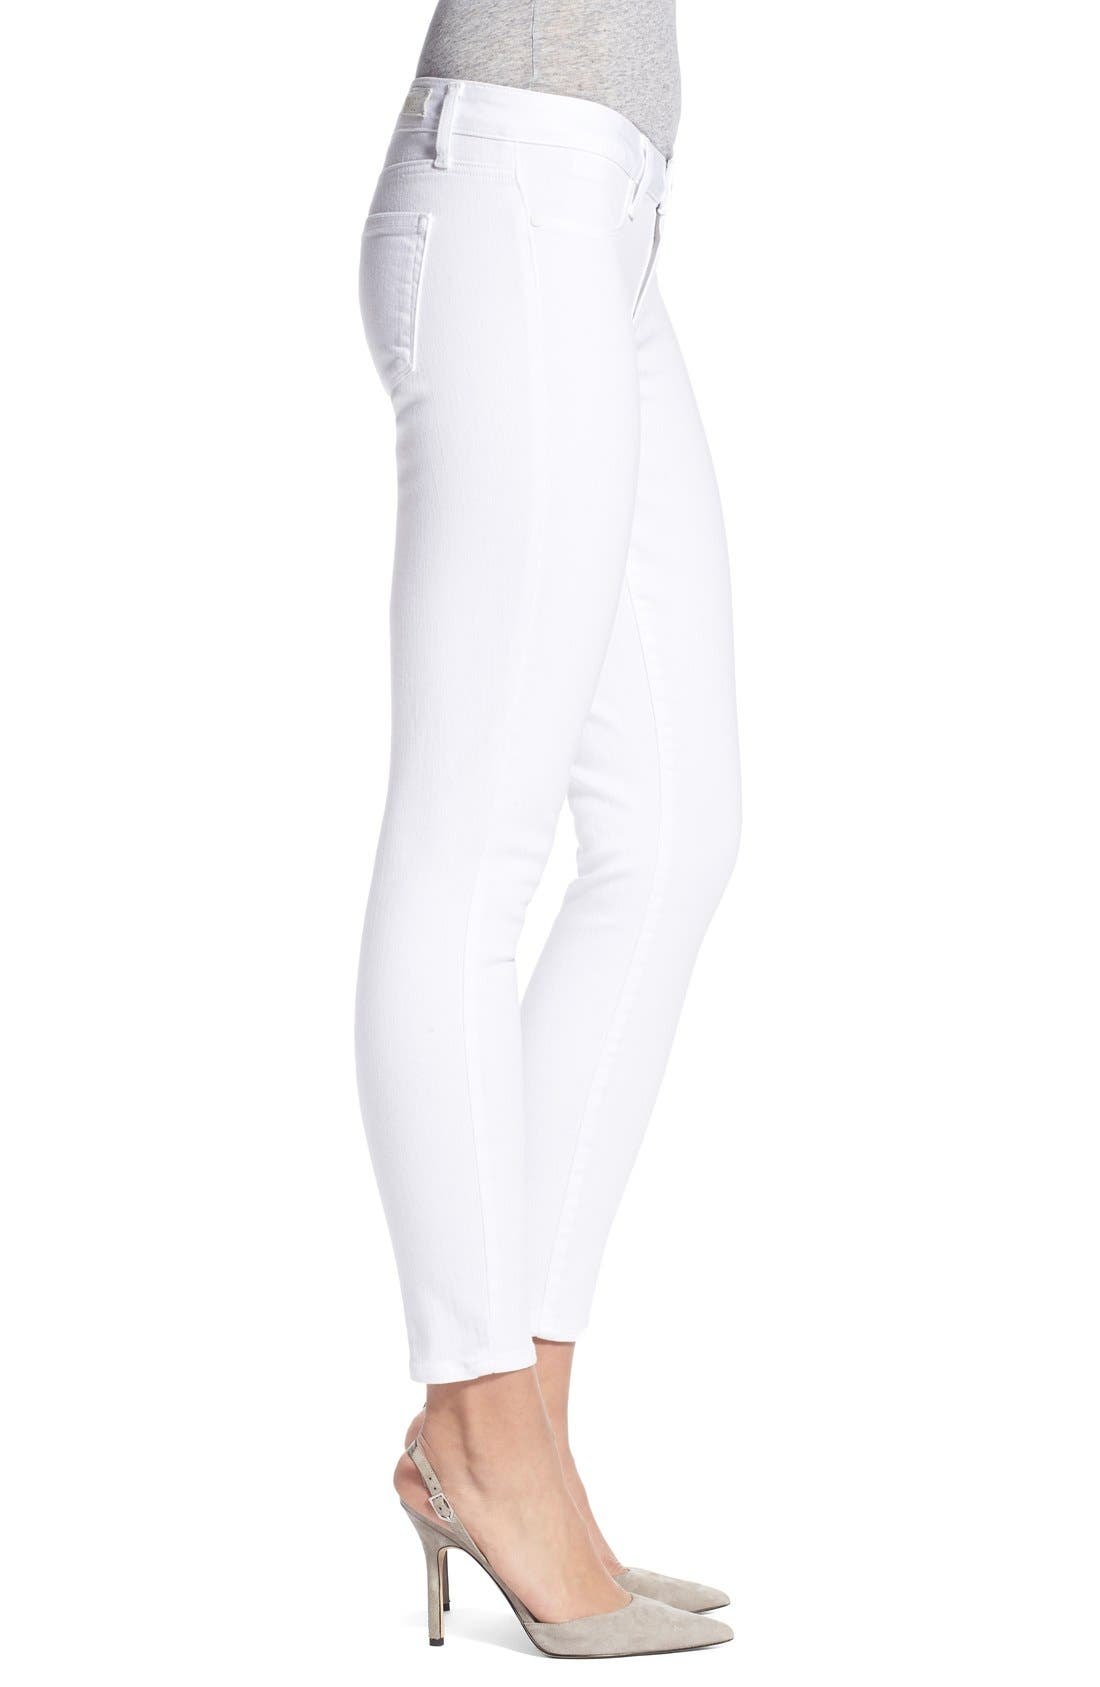 'Verdugo' Ankle Skinny Jeans,                             Alternate thumbnail 7, color,                             ULTRA WHITE